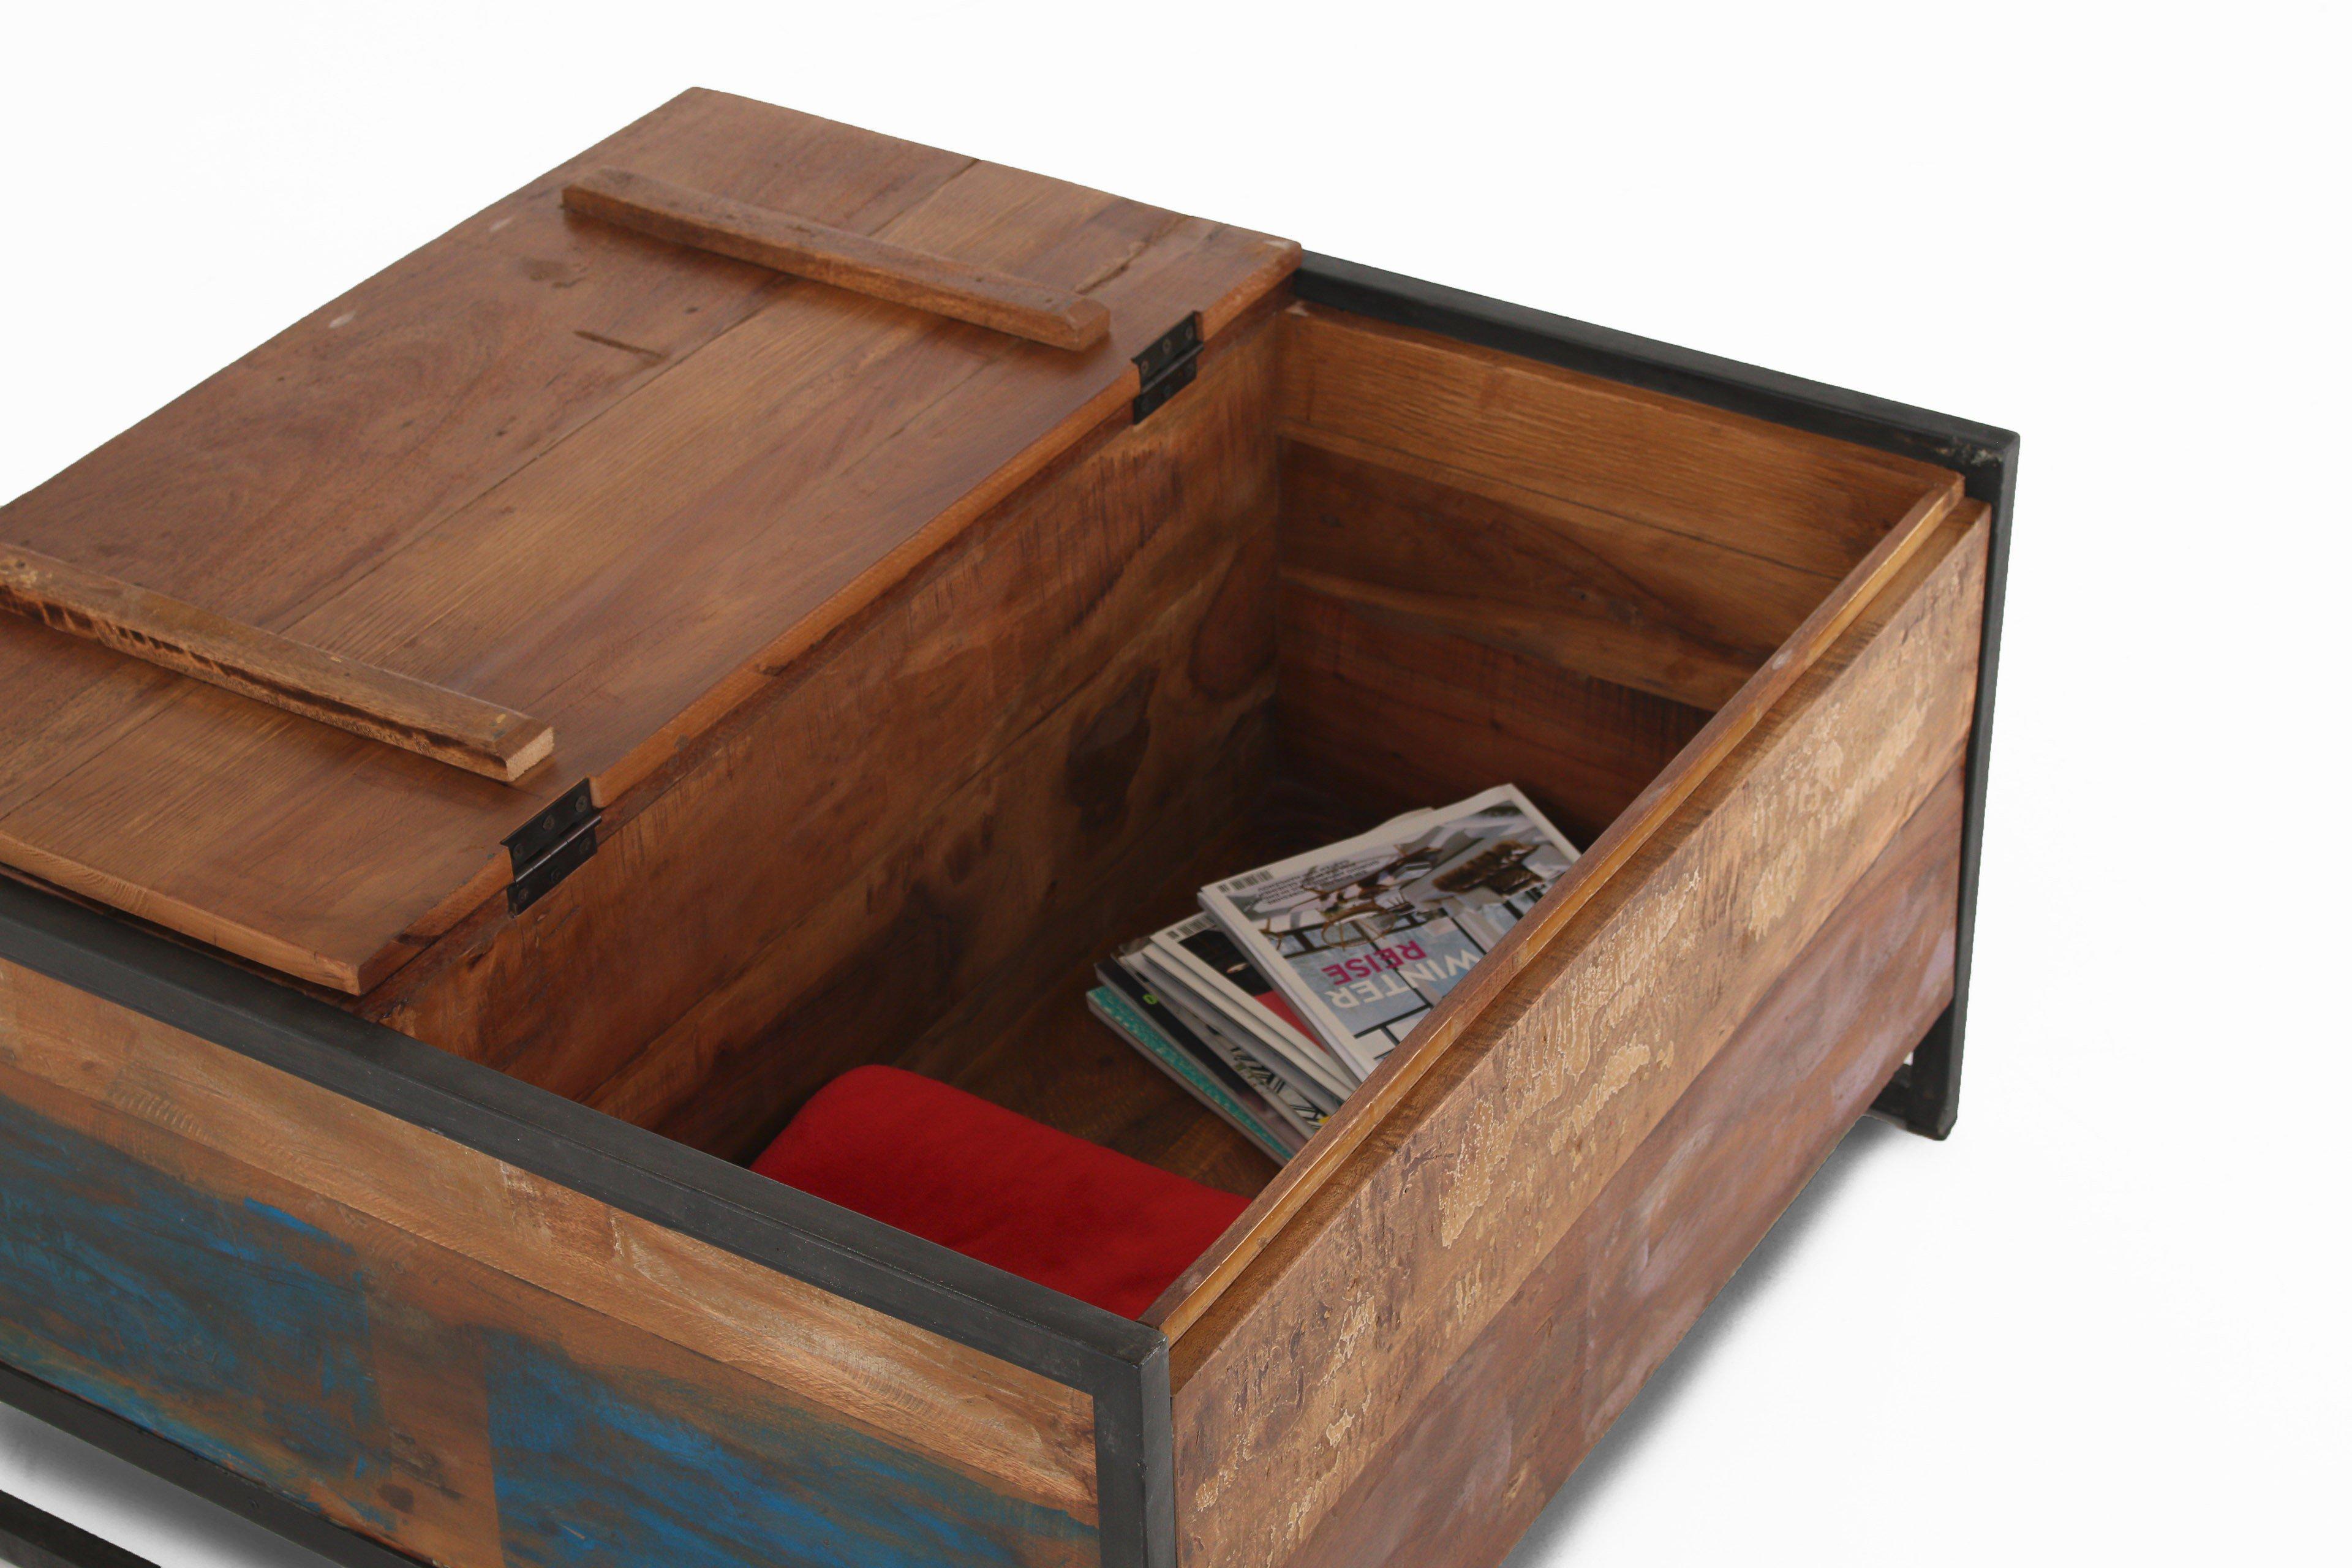 sit couchtisch bali altholz m bel letz ihr online shop. Black Bedroom Furniture Sets. Home Design Ideas